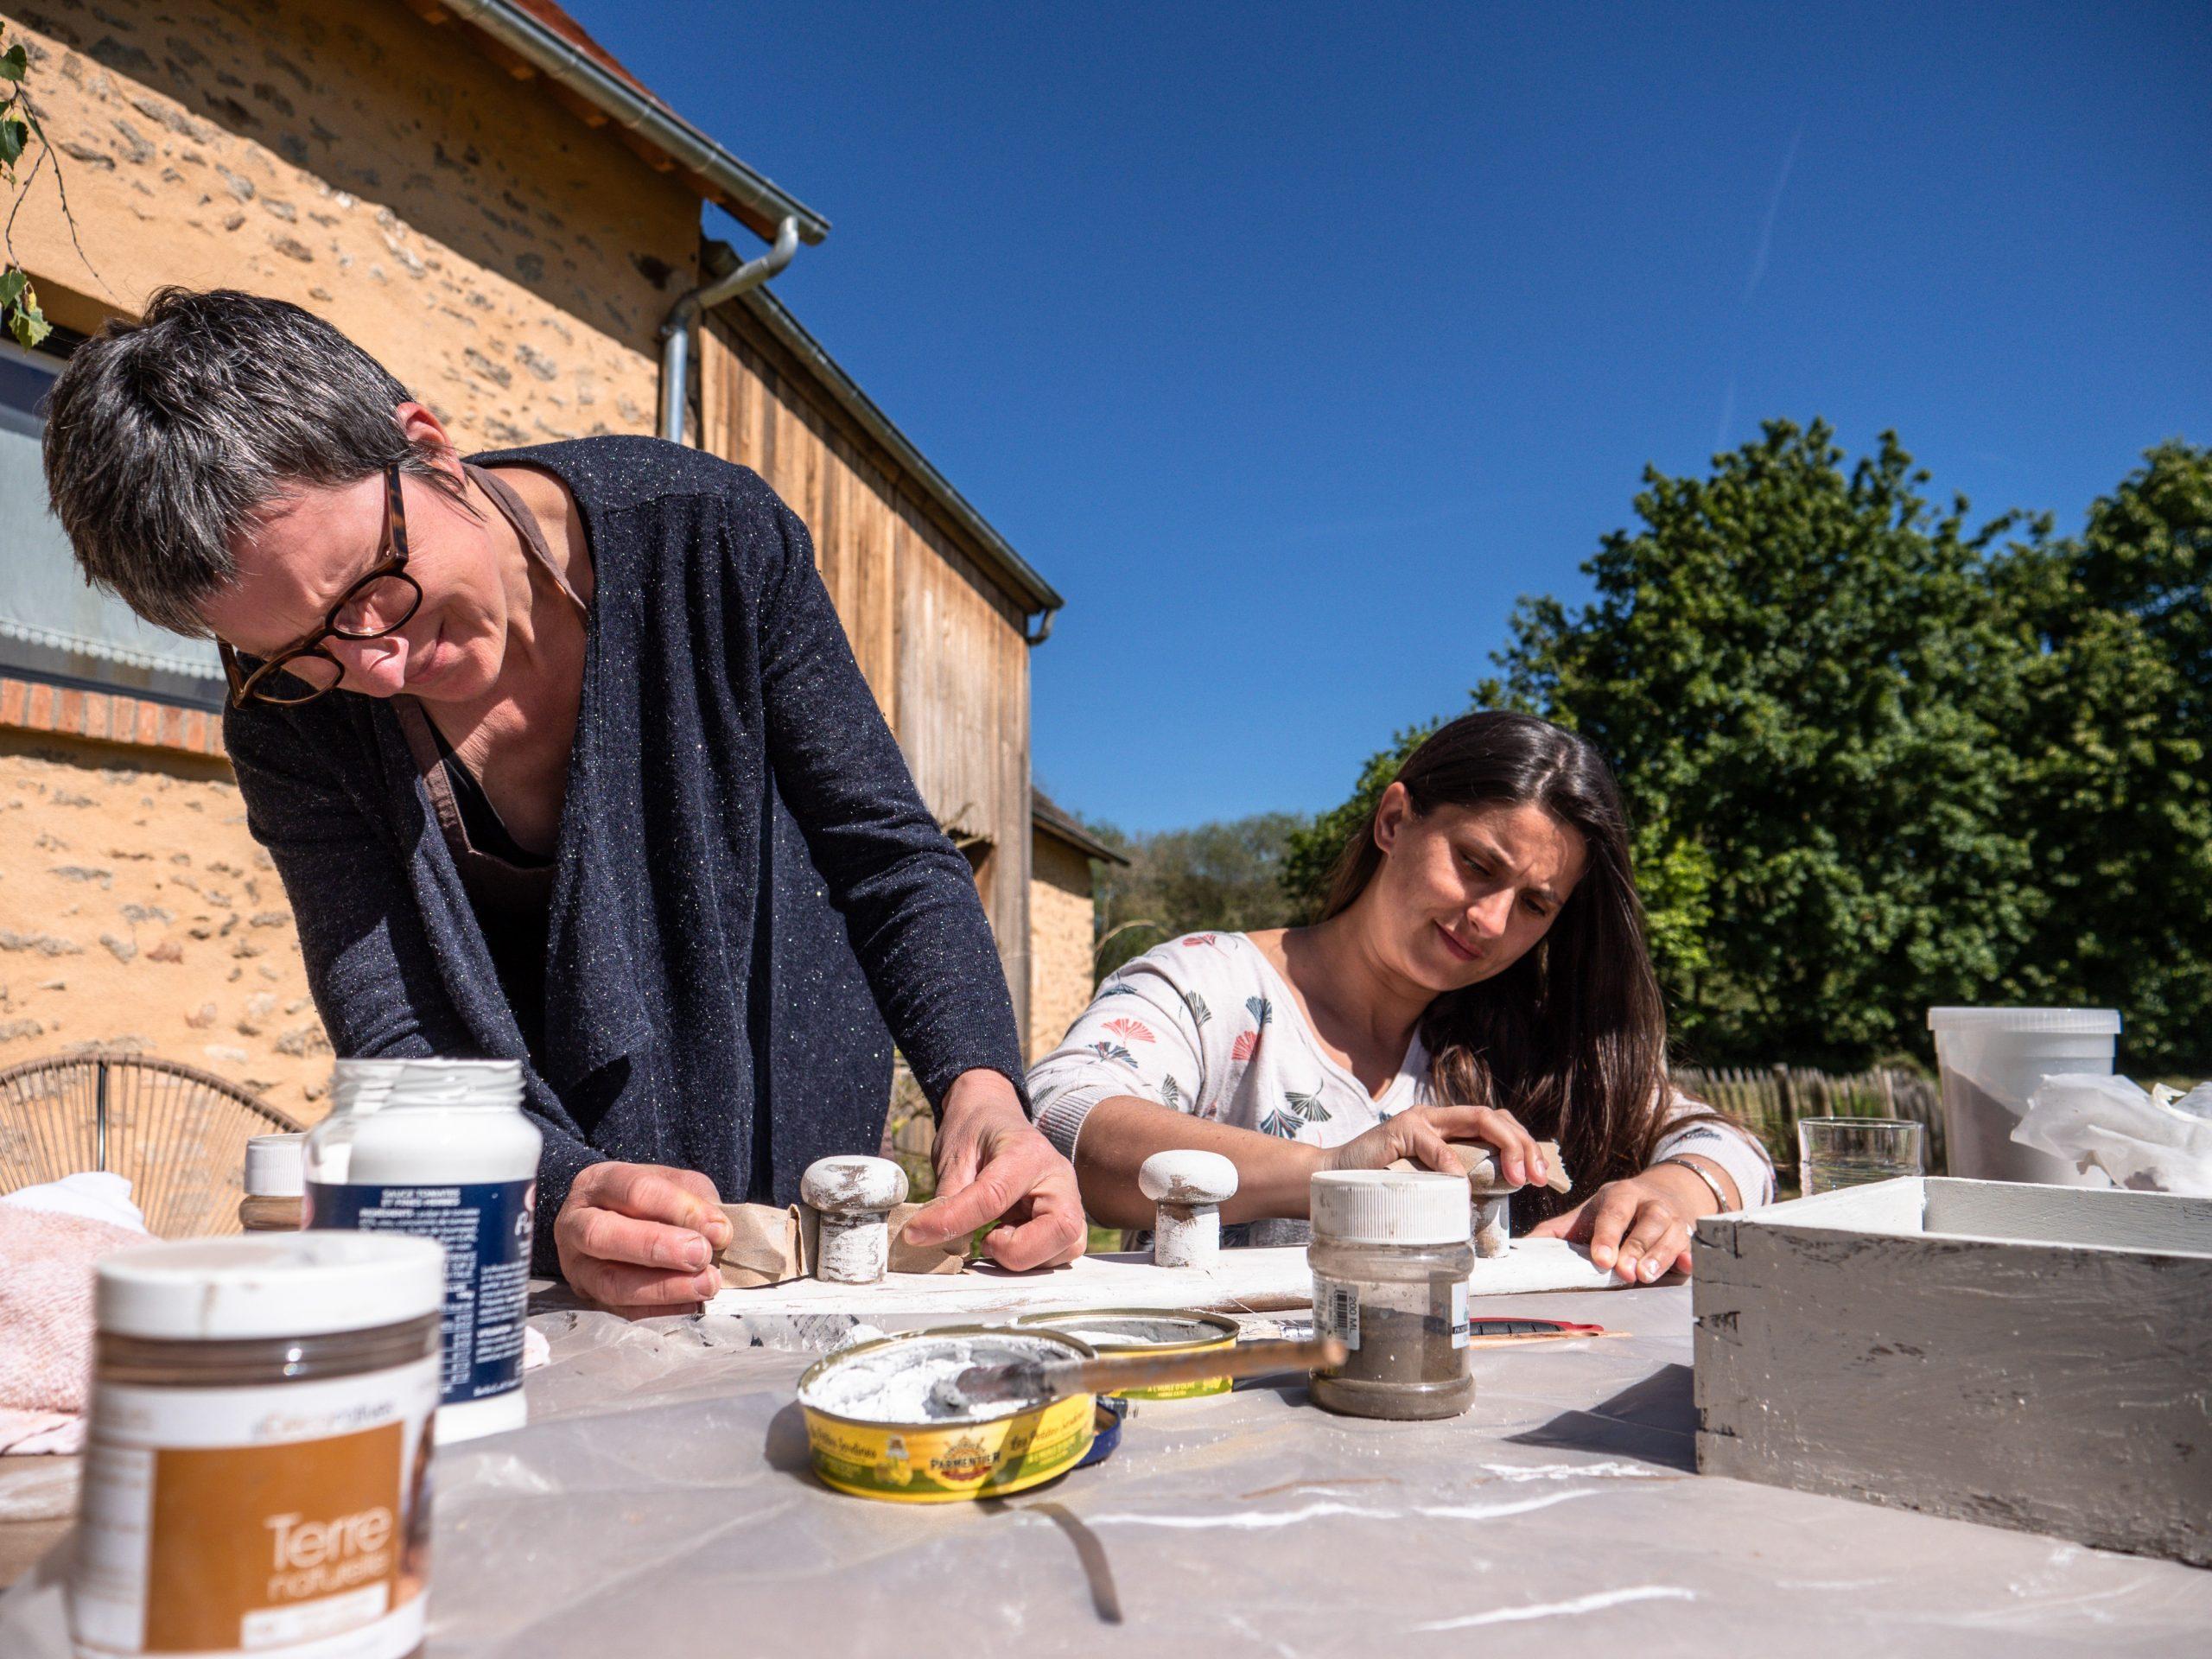 atelier patine 54737 scaled - Les globe blogueurs - blog voyage nature